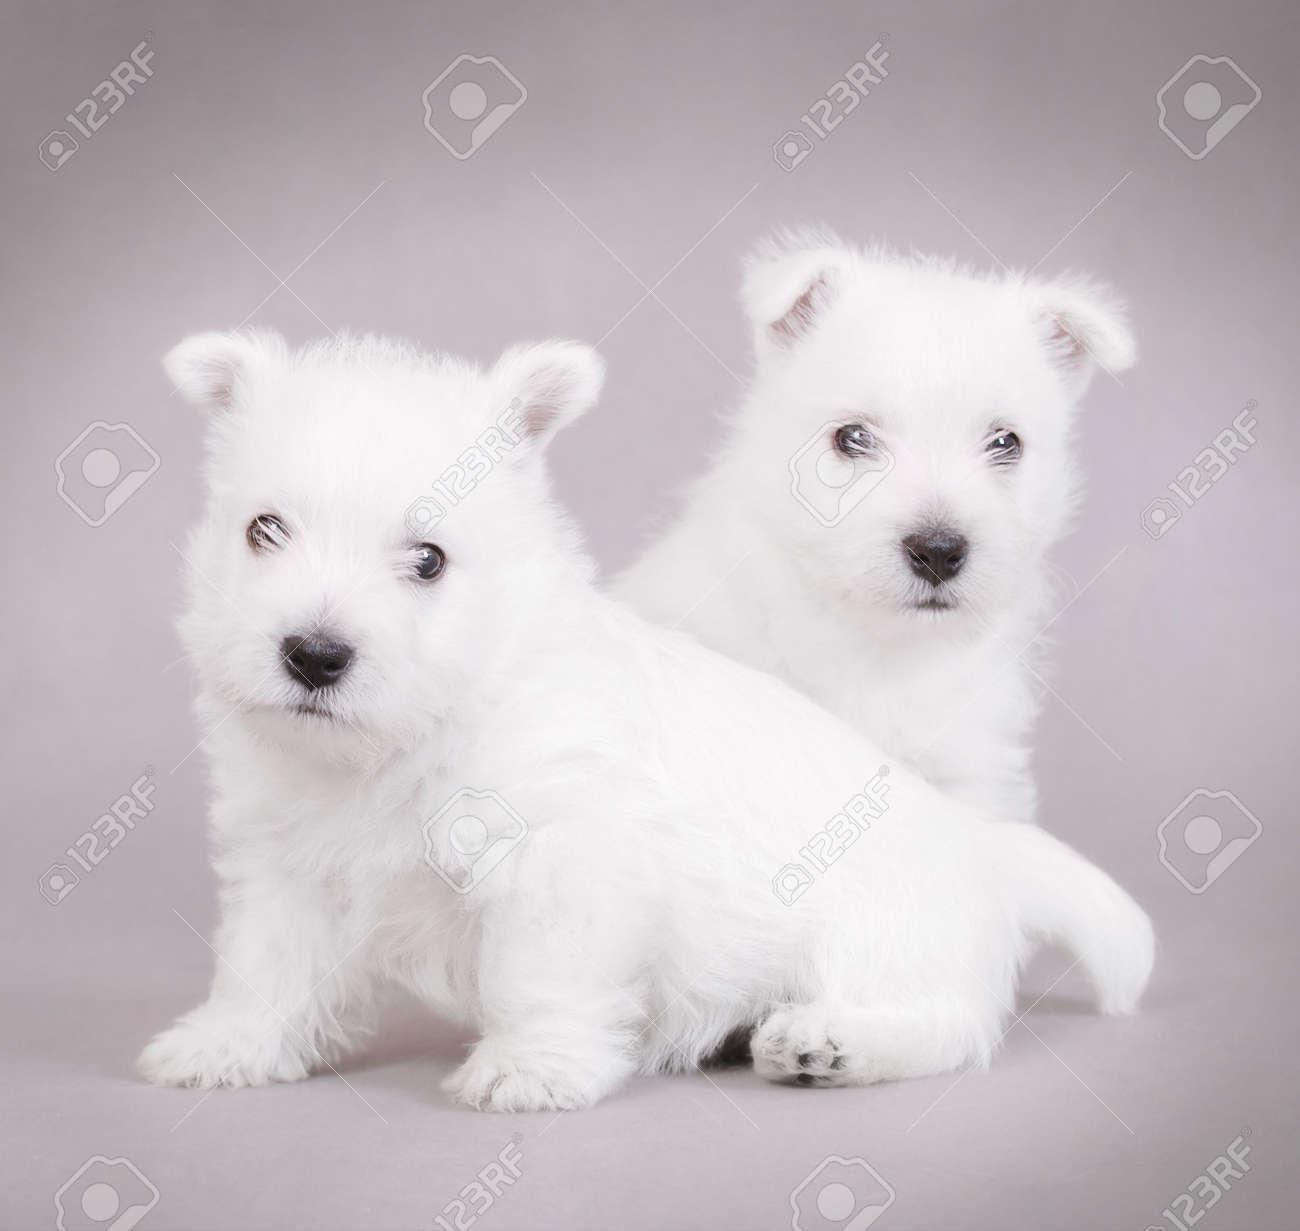 West Highland White Terrier puppies portrait Stock Photo - 5920627